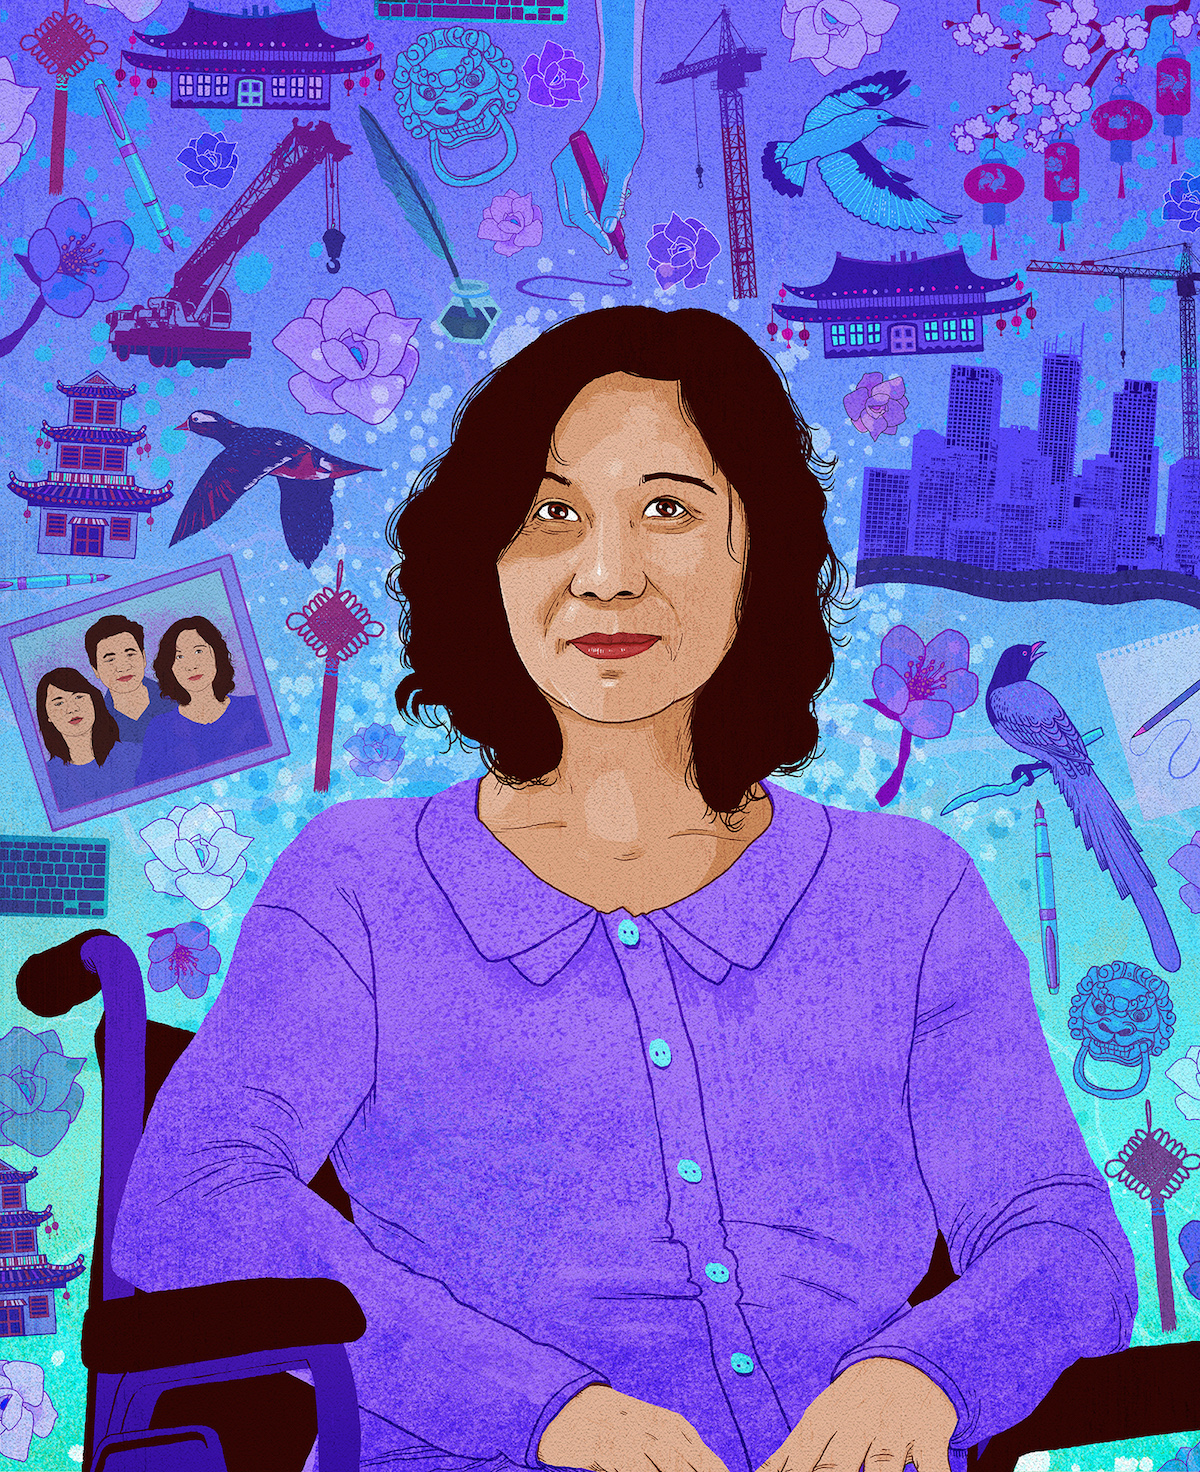 rebecca-hendin-amnesty-international-portrait-illustration-ni-yulan-3-1200pixelswide